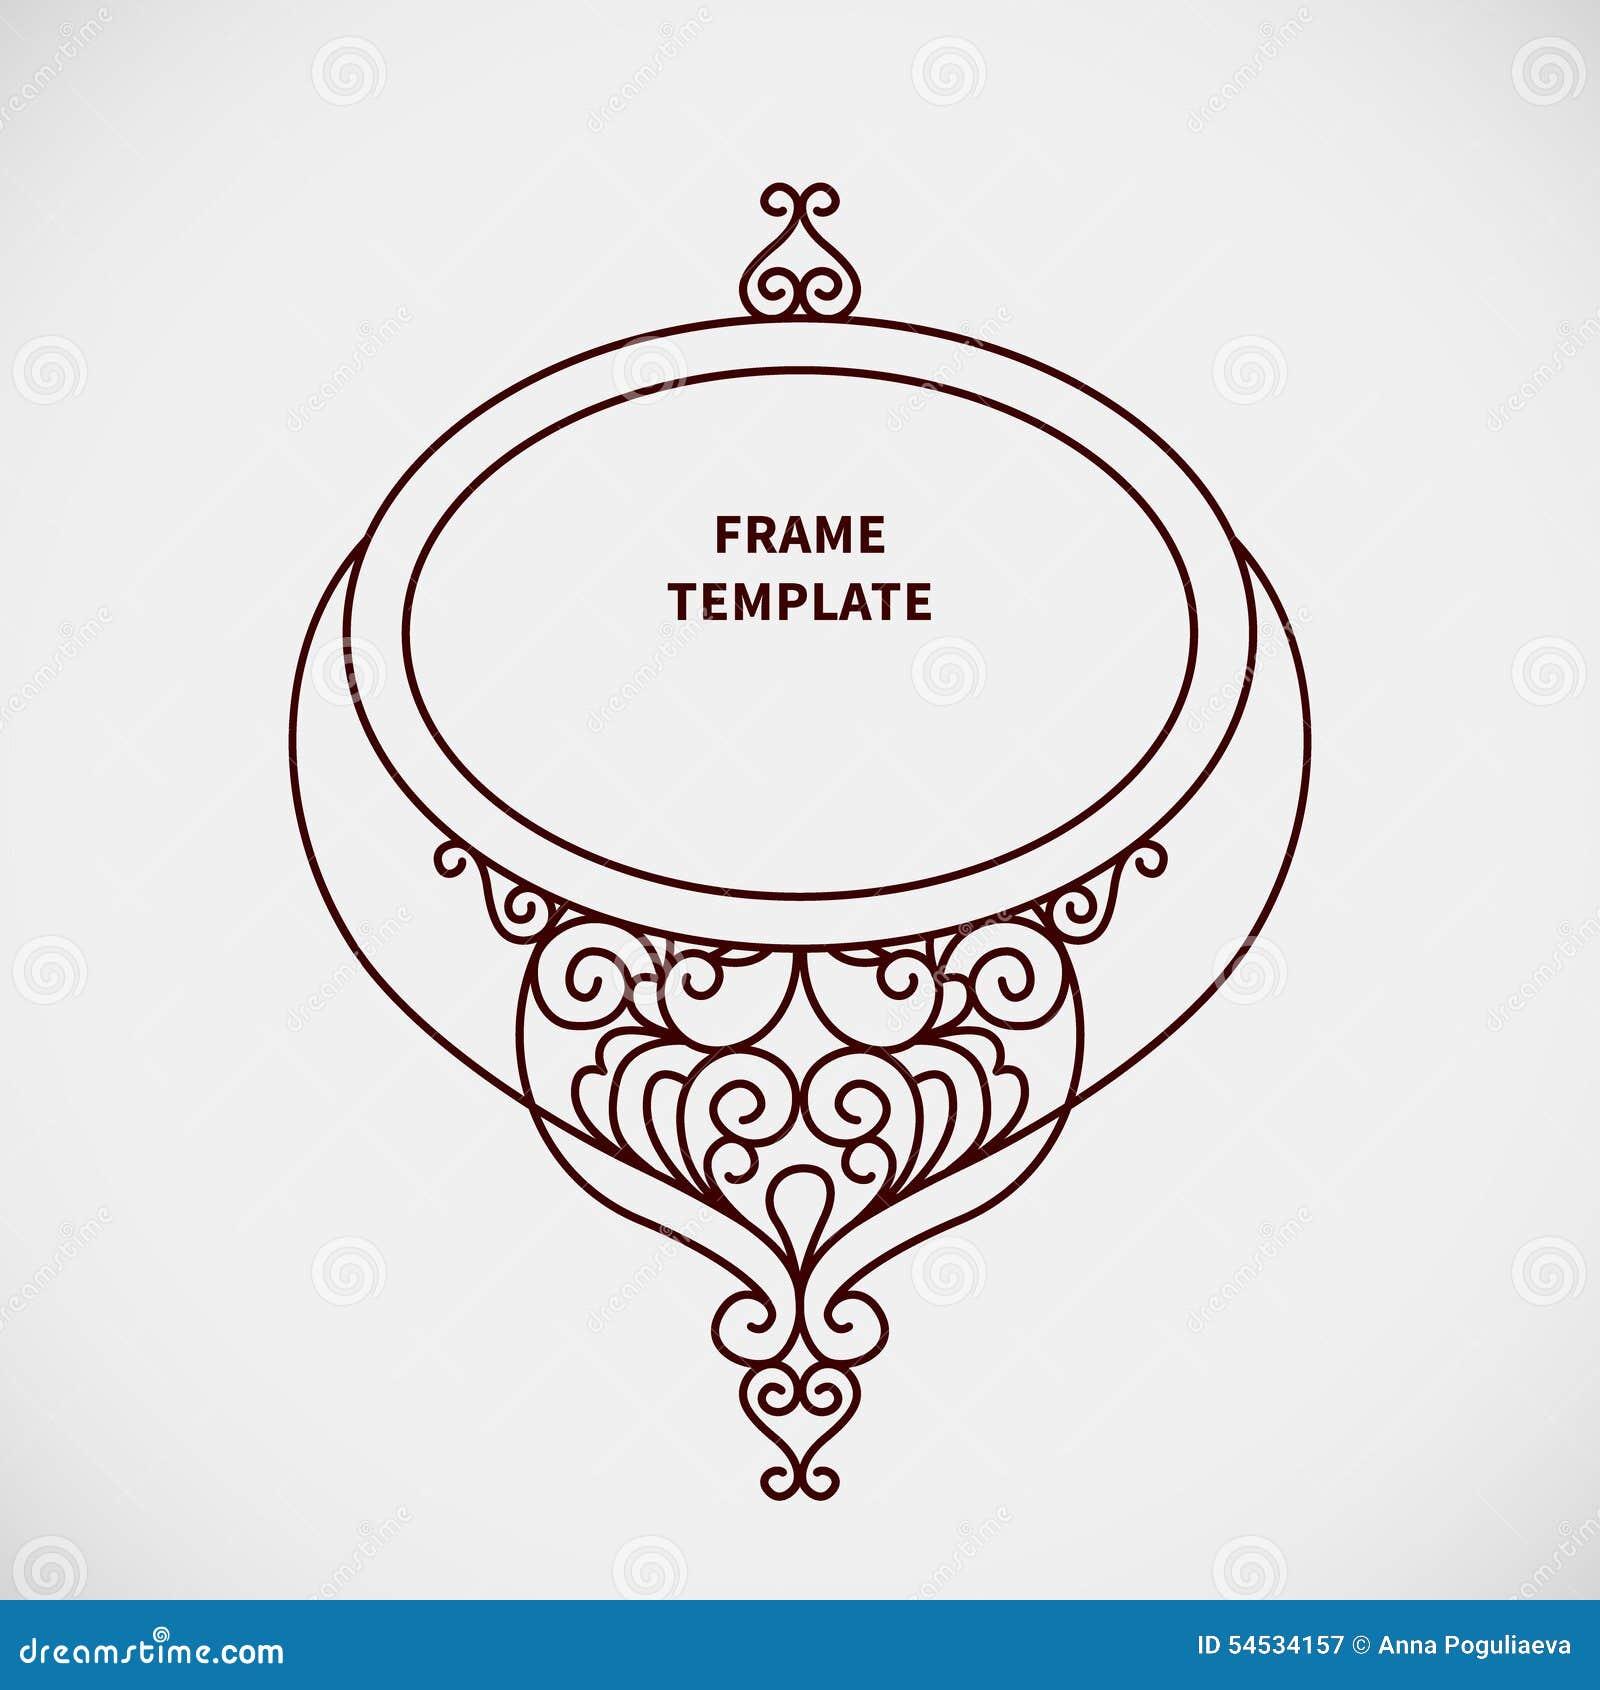 Vector Decorative Line Art Frame For Design Template. Stock Vector ...